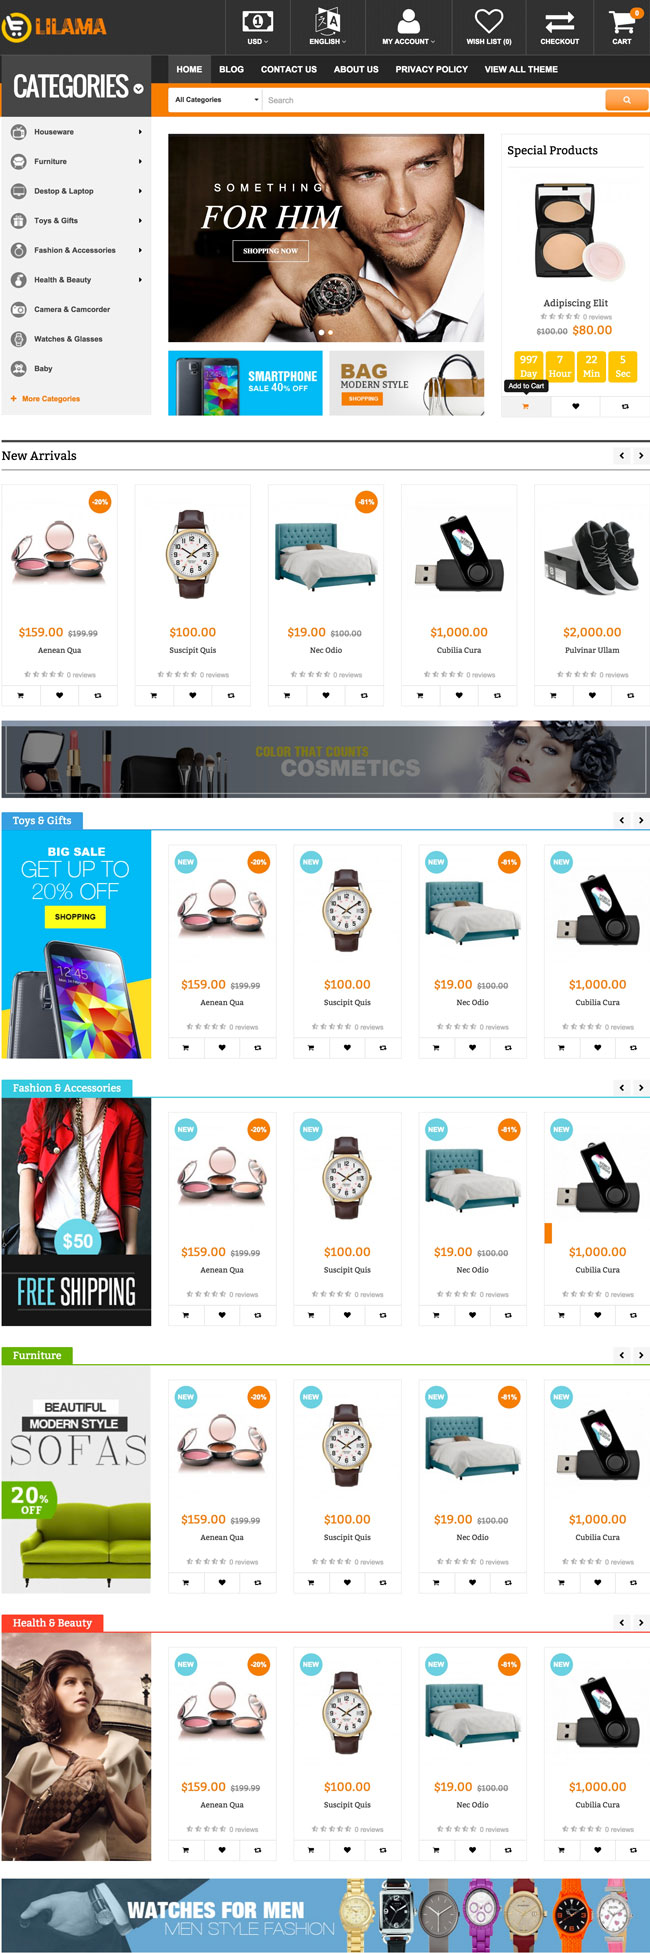 Lilama-Mega-Shop-Responsive-OpenCart-2-Theme